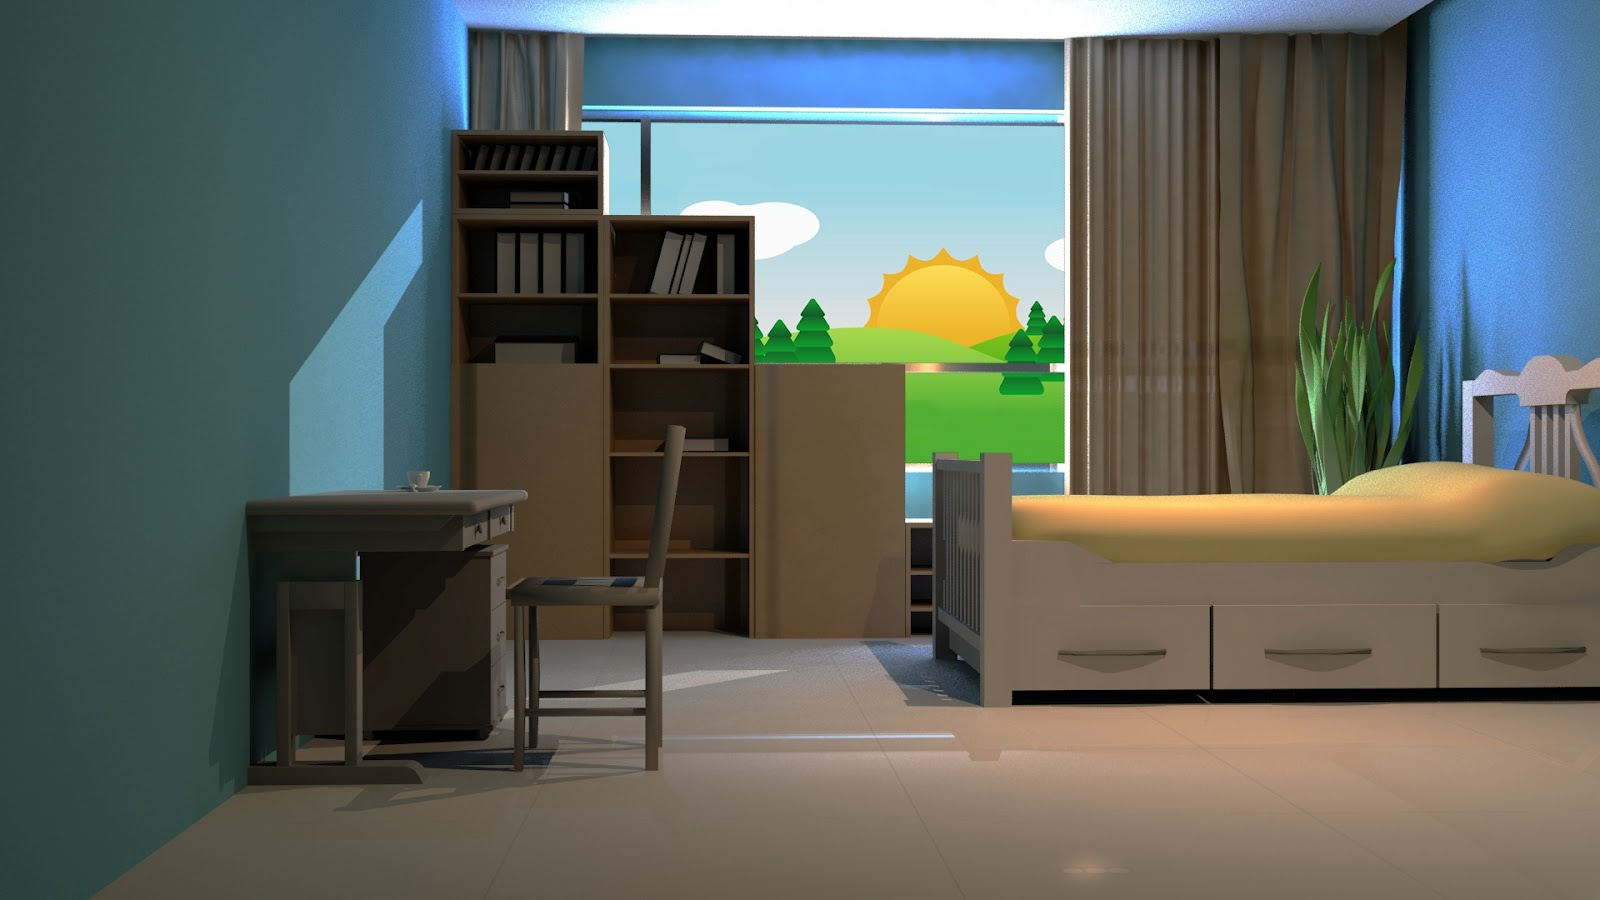 3d world animation cartoon interior